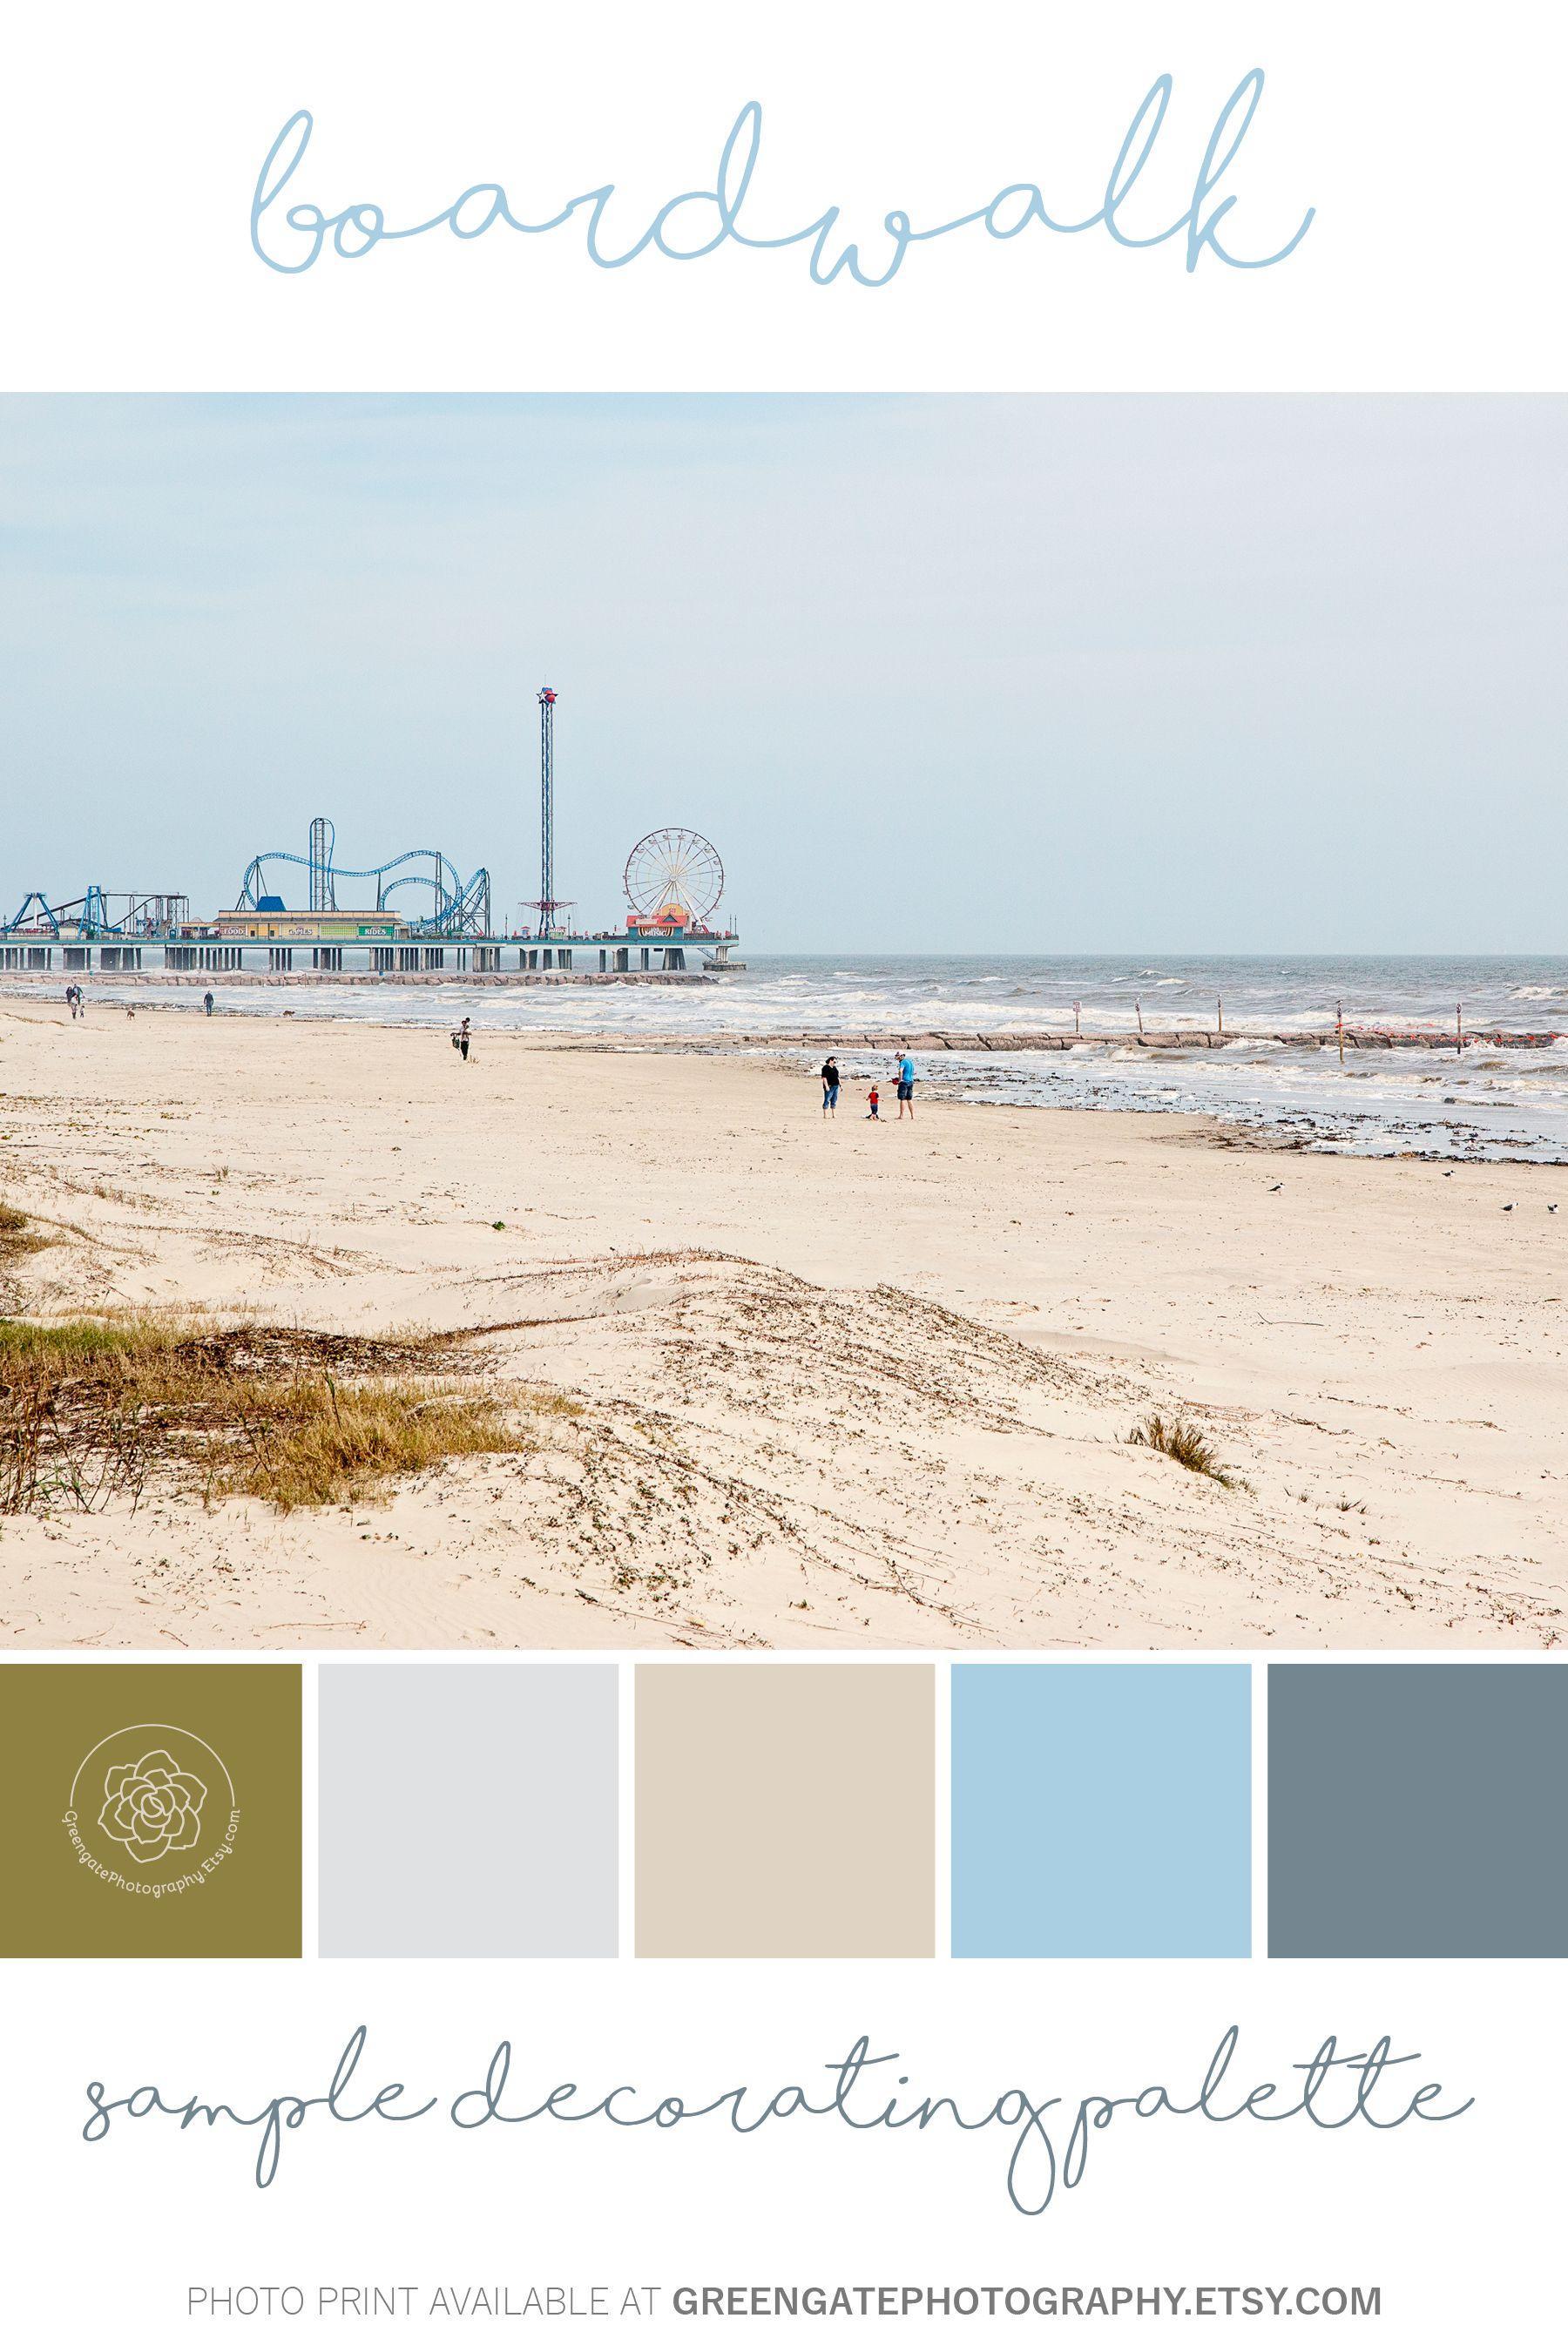 Boardwalk Photo Print Galveston Island Texas Gulf Of Mexico